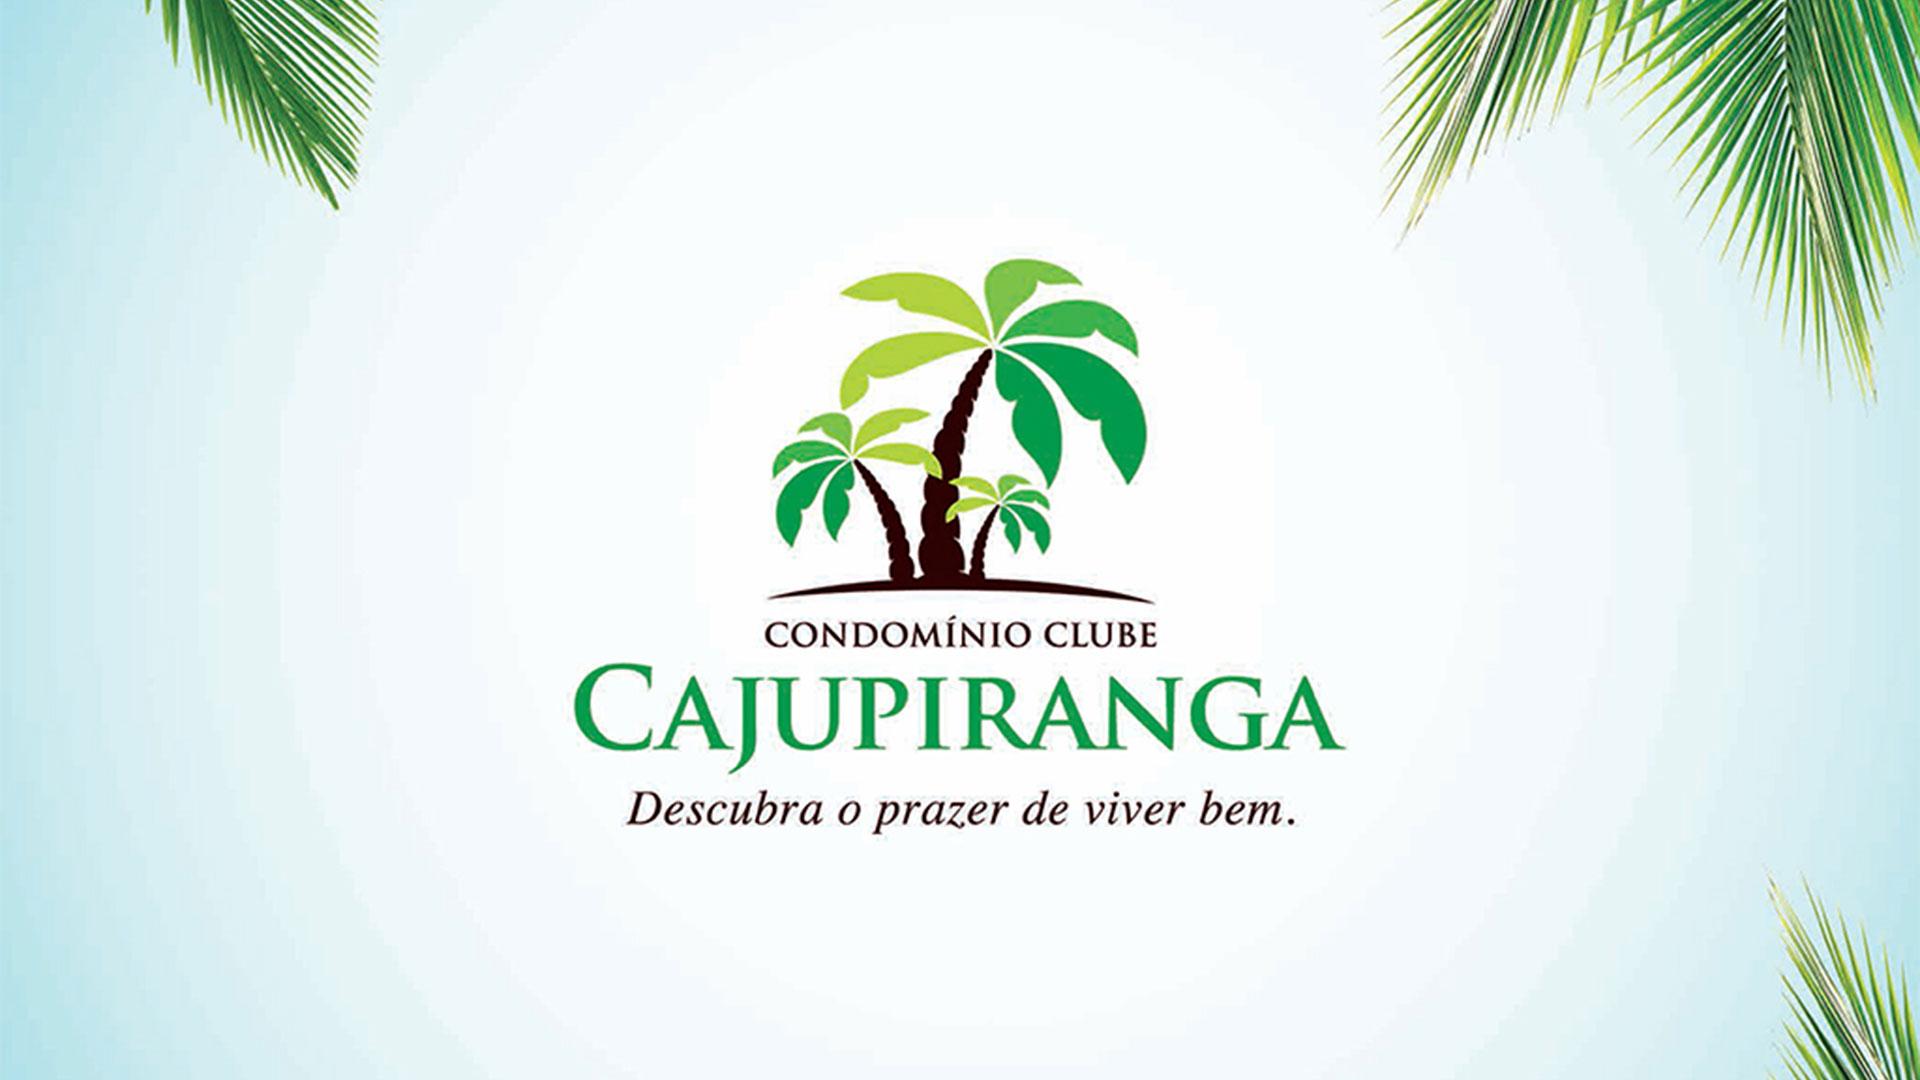 Condomínio Clube Cajupiranga – FM Empreendimentos #89A427 1920 1080